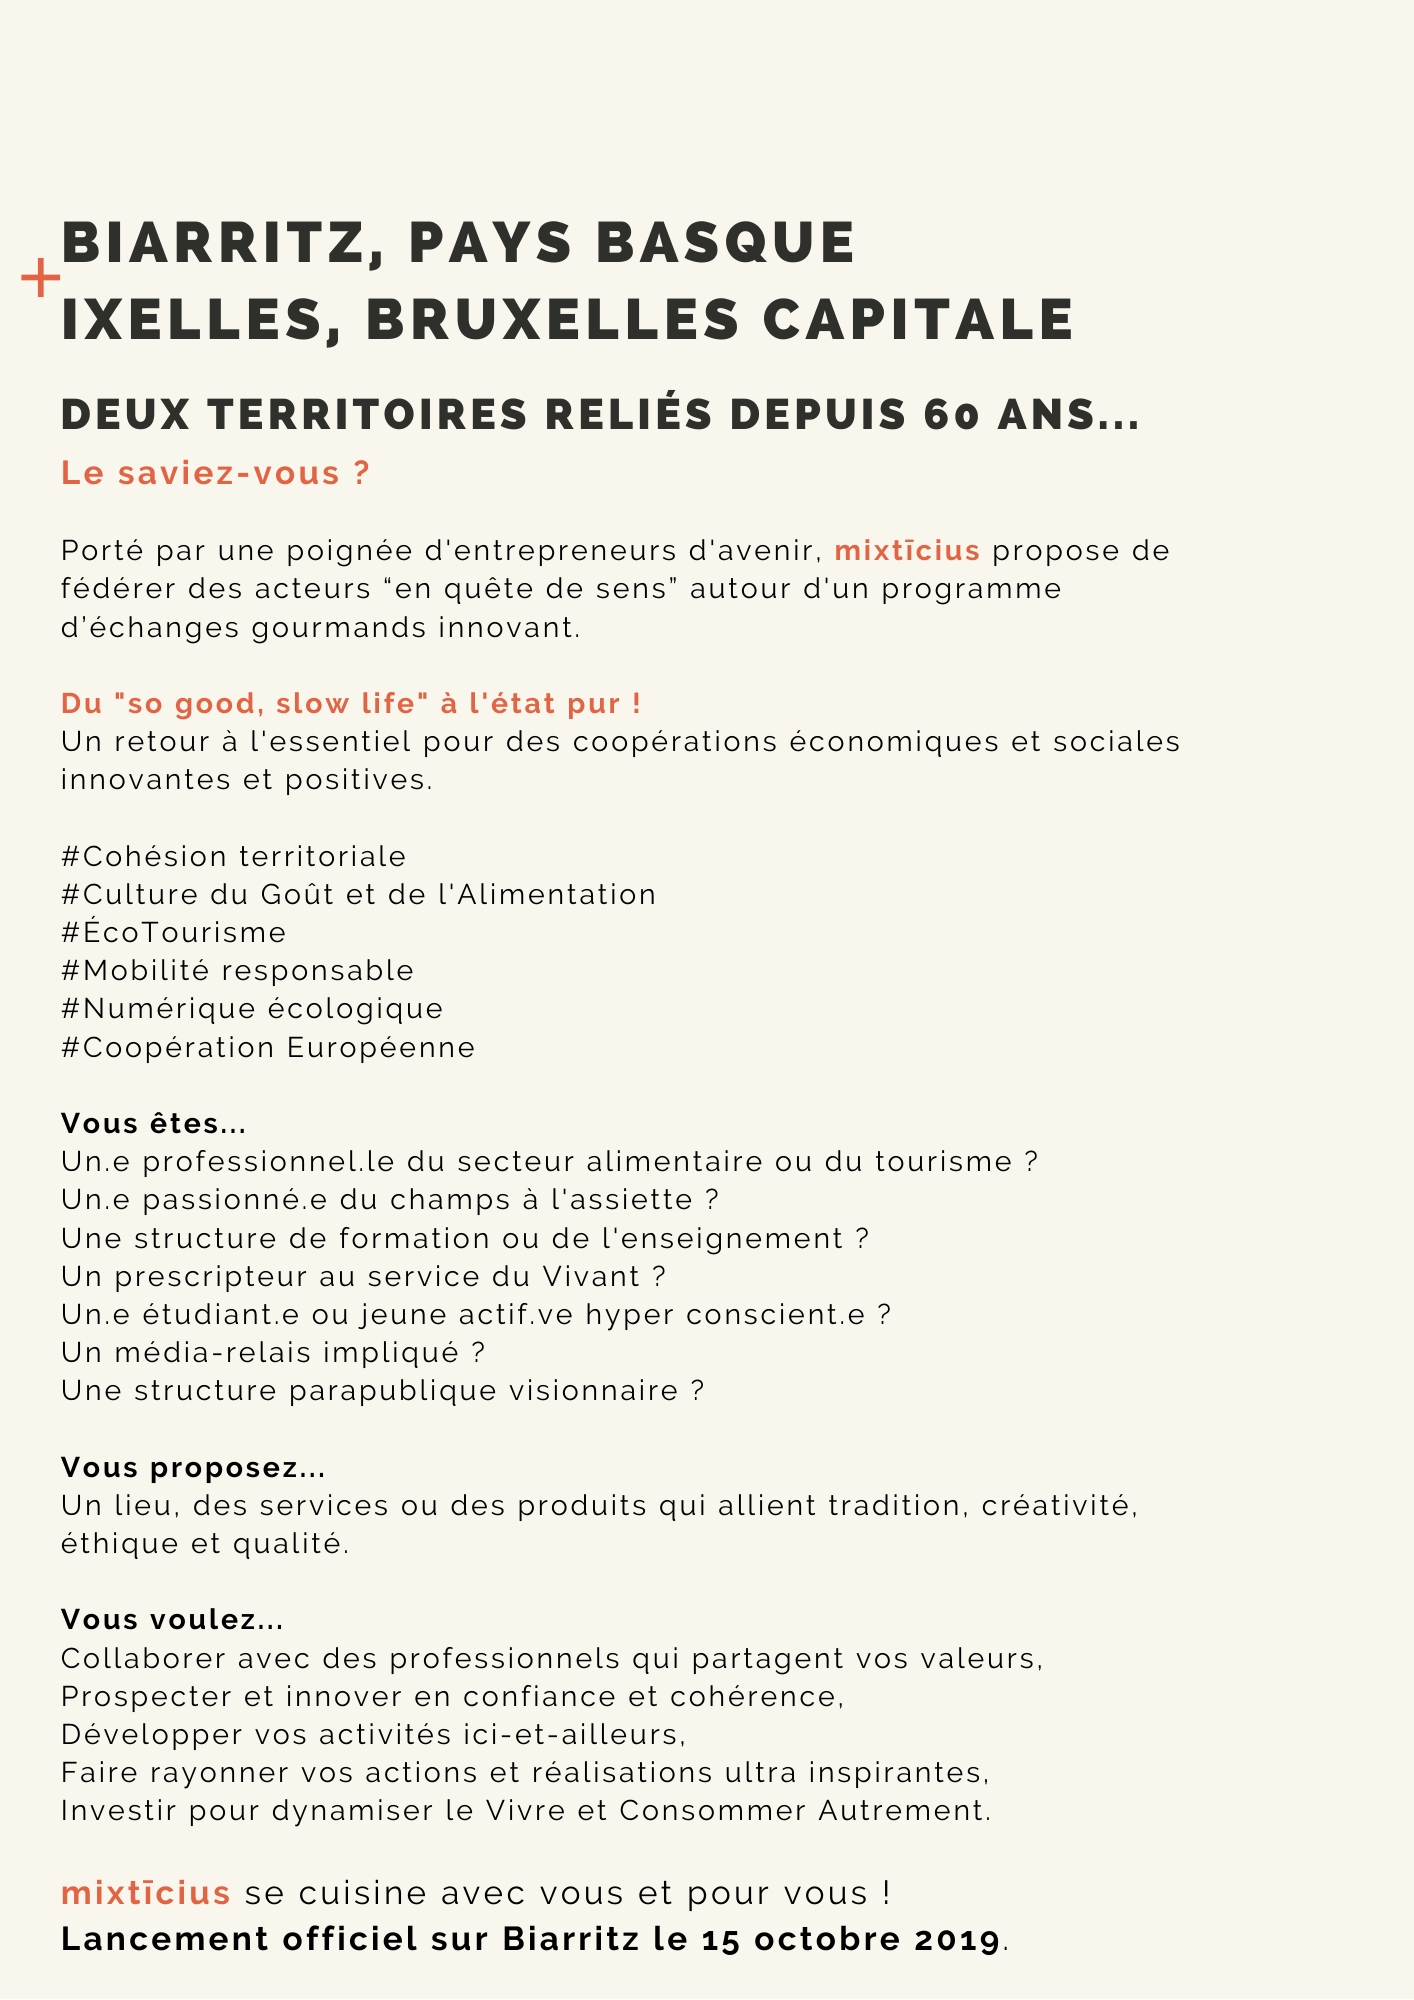 Lancement Mixticius Biarritz (1).jpg<br/><span></span>